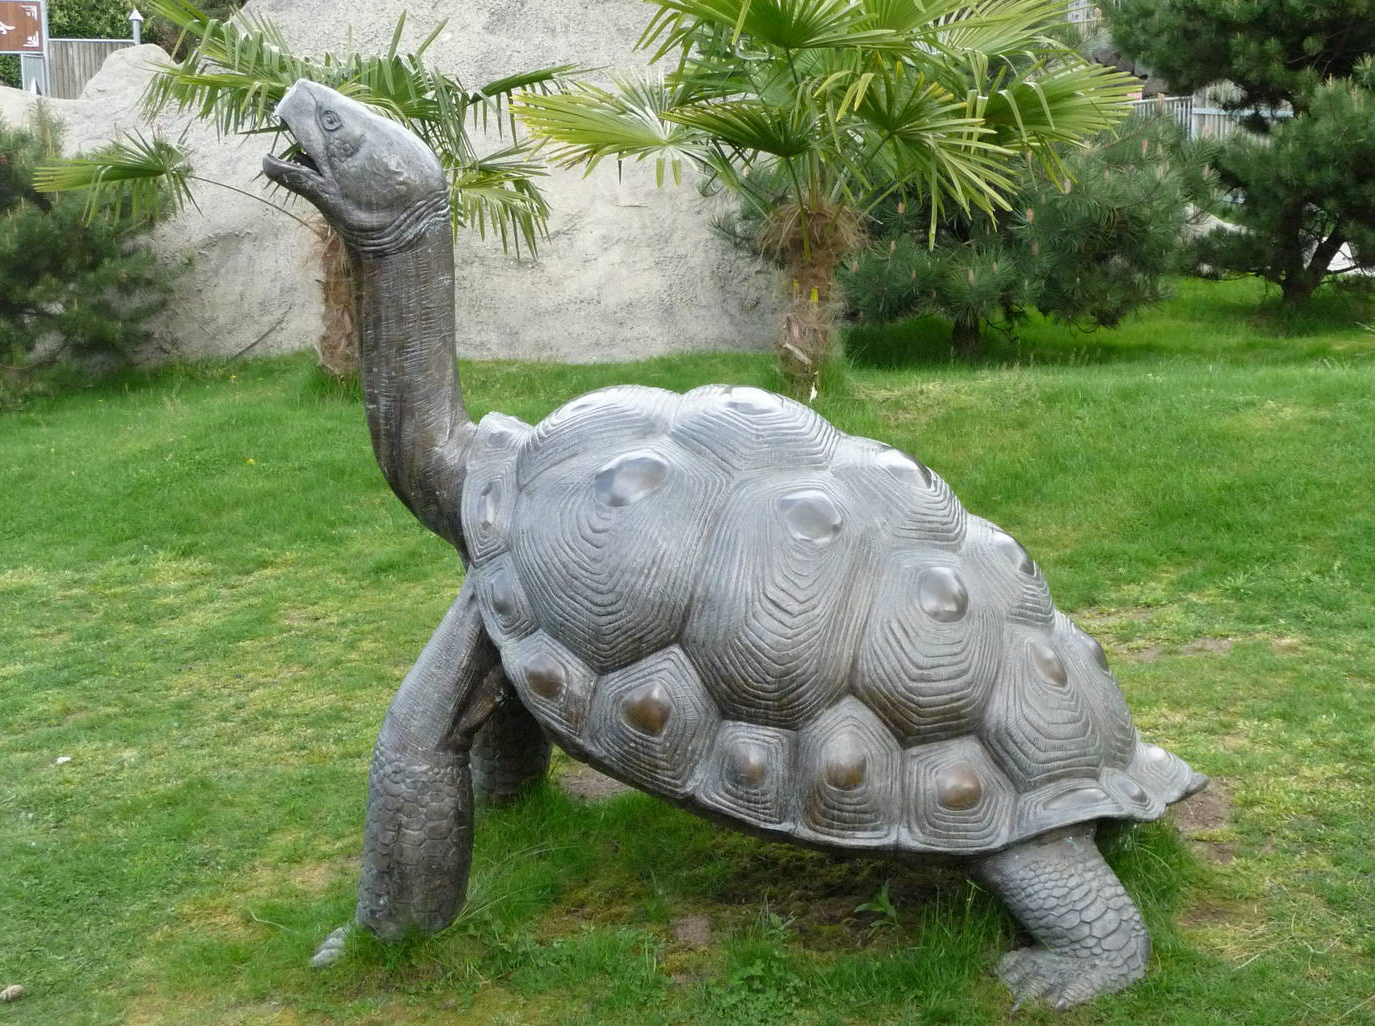 Large Life Size Bronze Outdoor Garden Turtle Sculpture